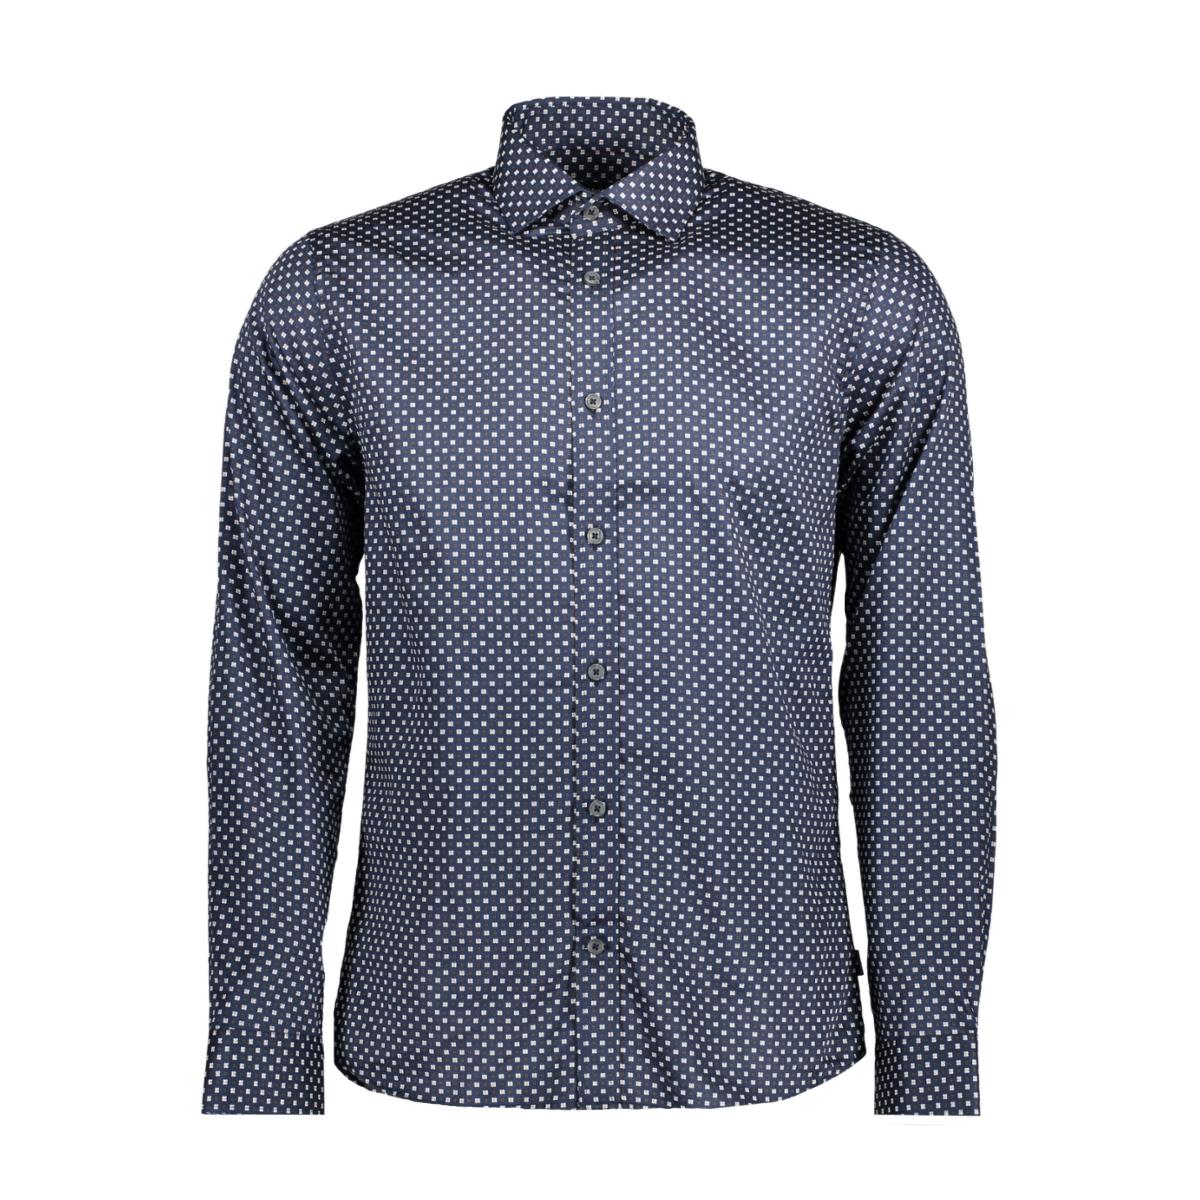 30202402 matinique overhemd 20211